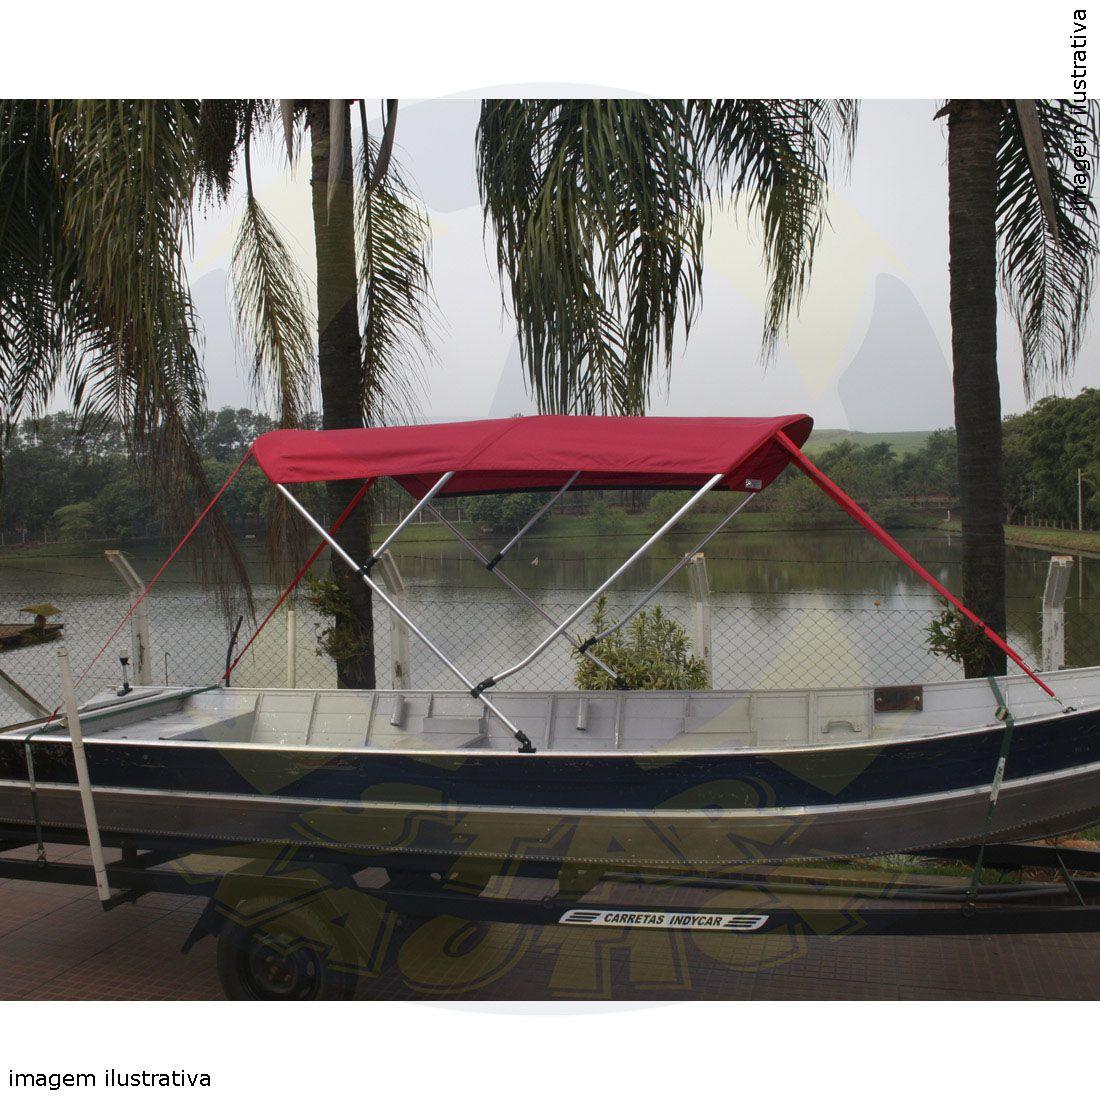 Capota Toldo Barco Big Fish 5014 Poliéster 3 Arcos Tubo 1 1/4